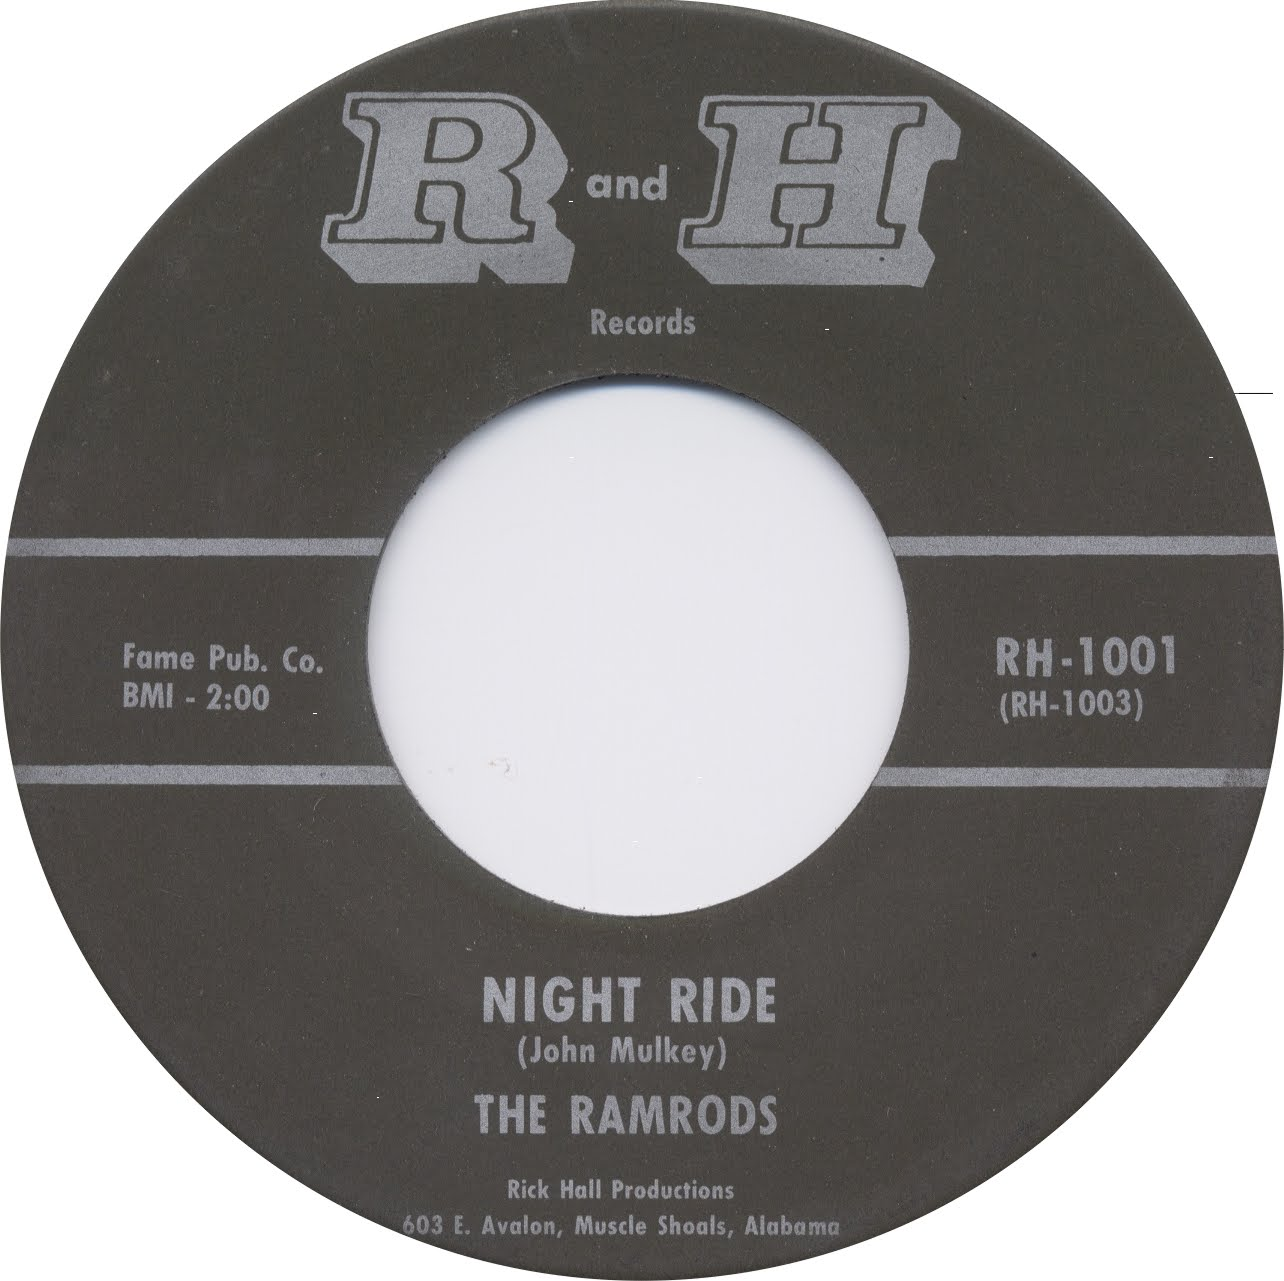 The Ramrods Night Ride